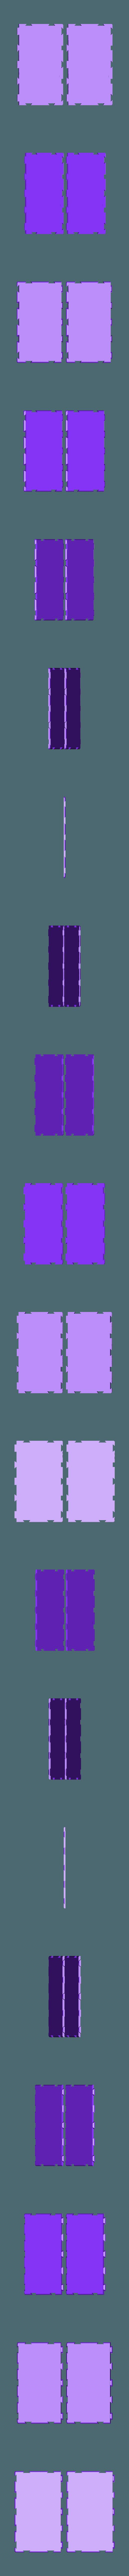 box_sides.stl Download free STL file Coffee Grinder • 3D printer template, Wachet